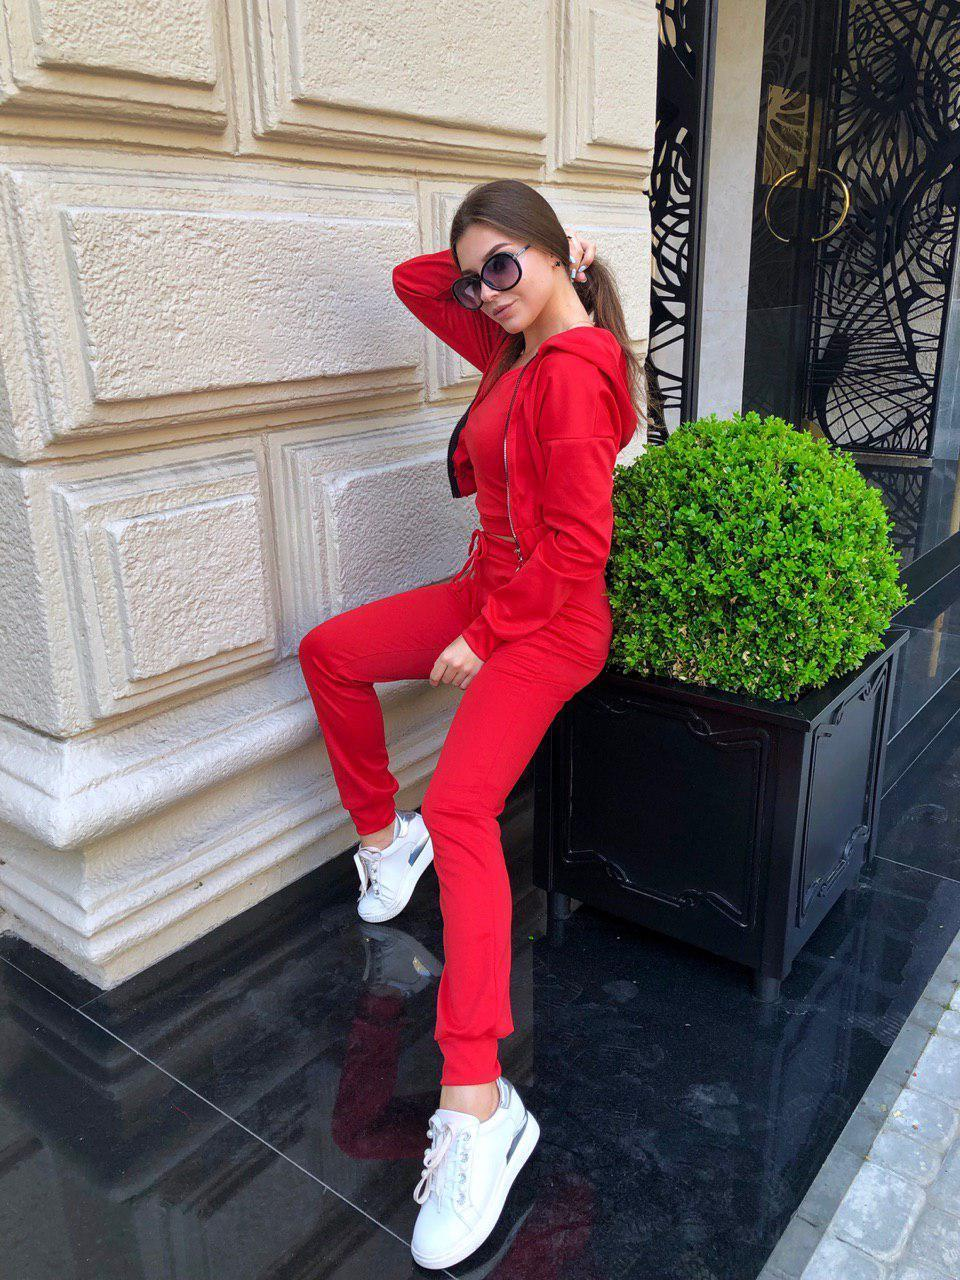 Костюм женский тройка бомбер+топ+штаны трикотаж Красный